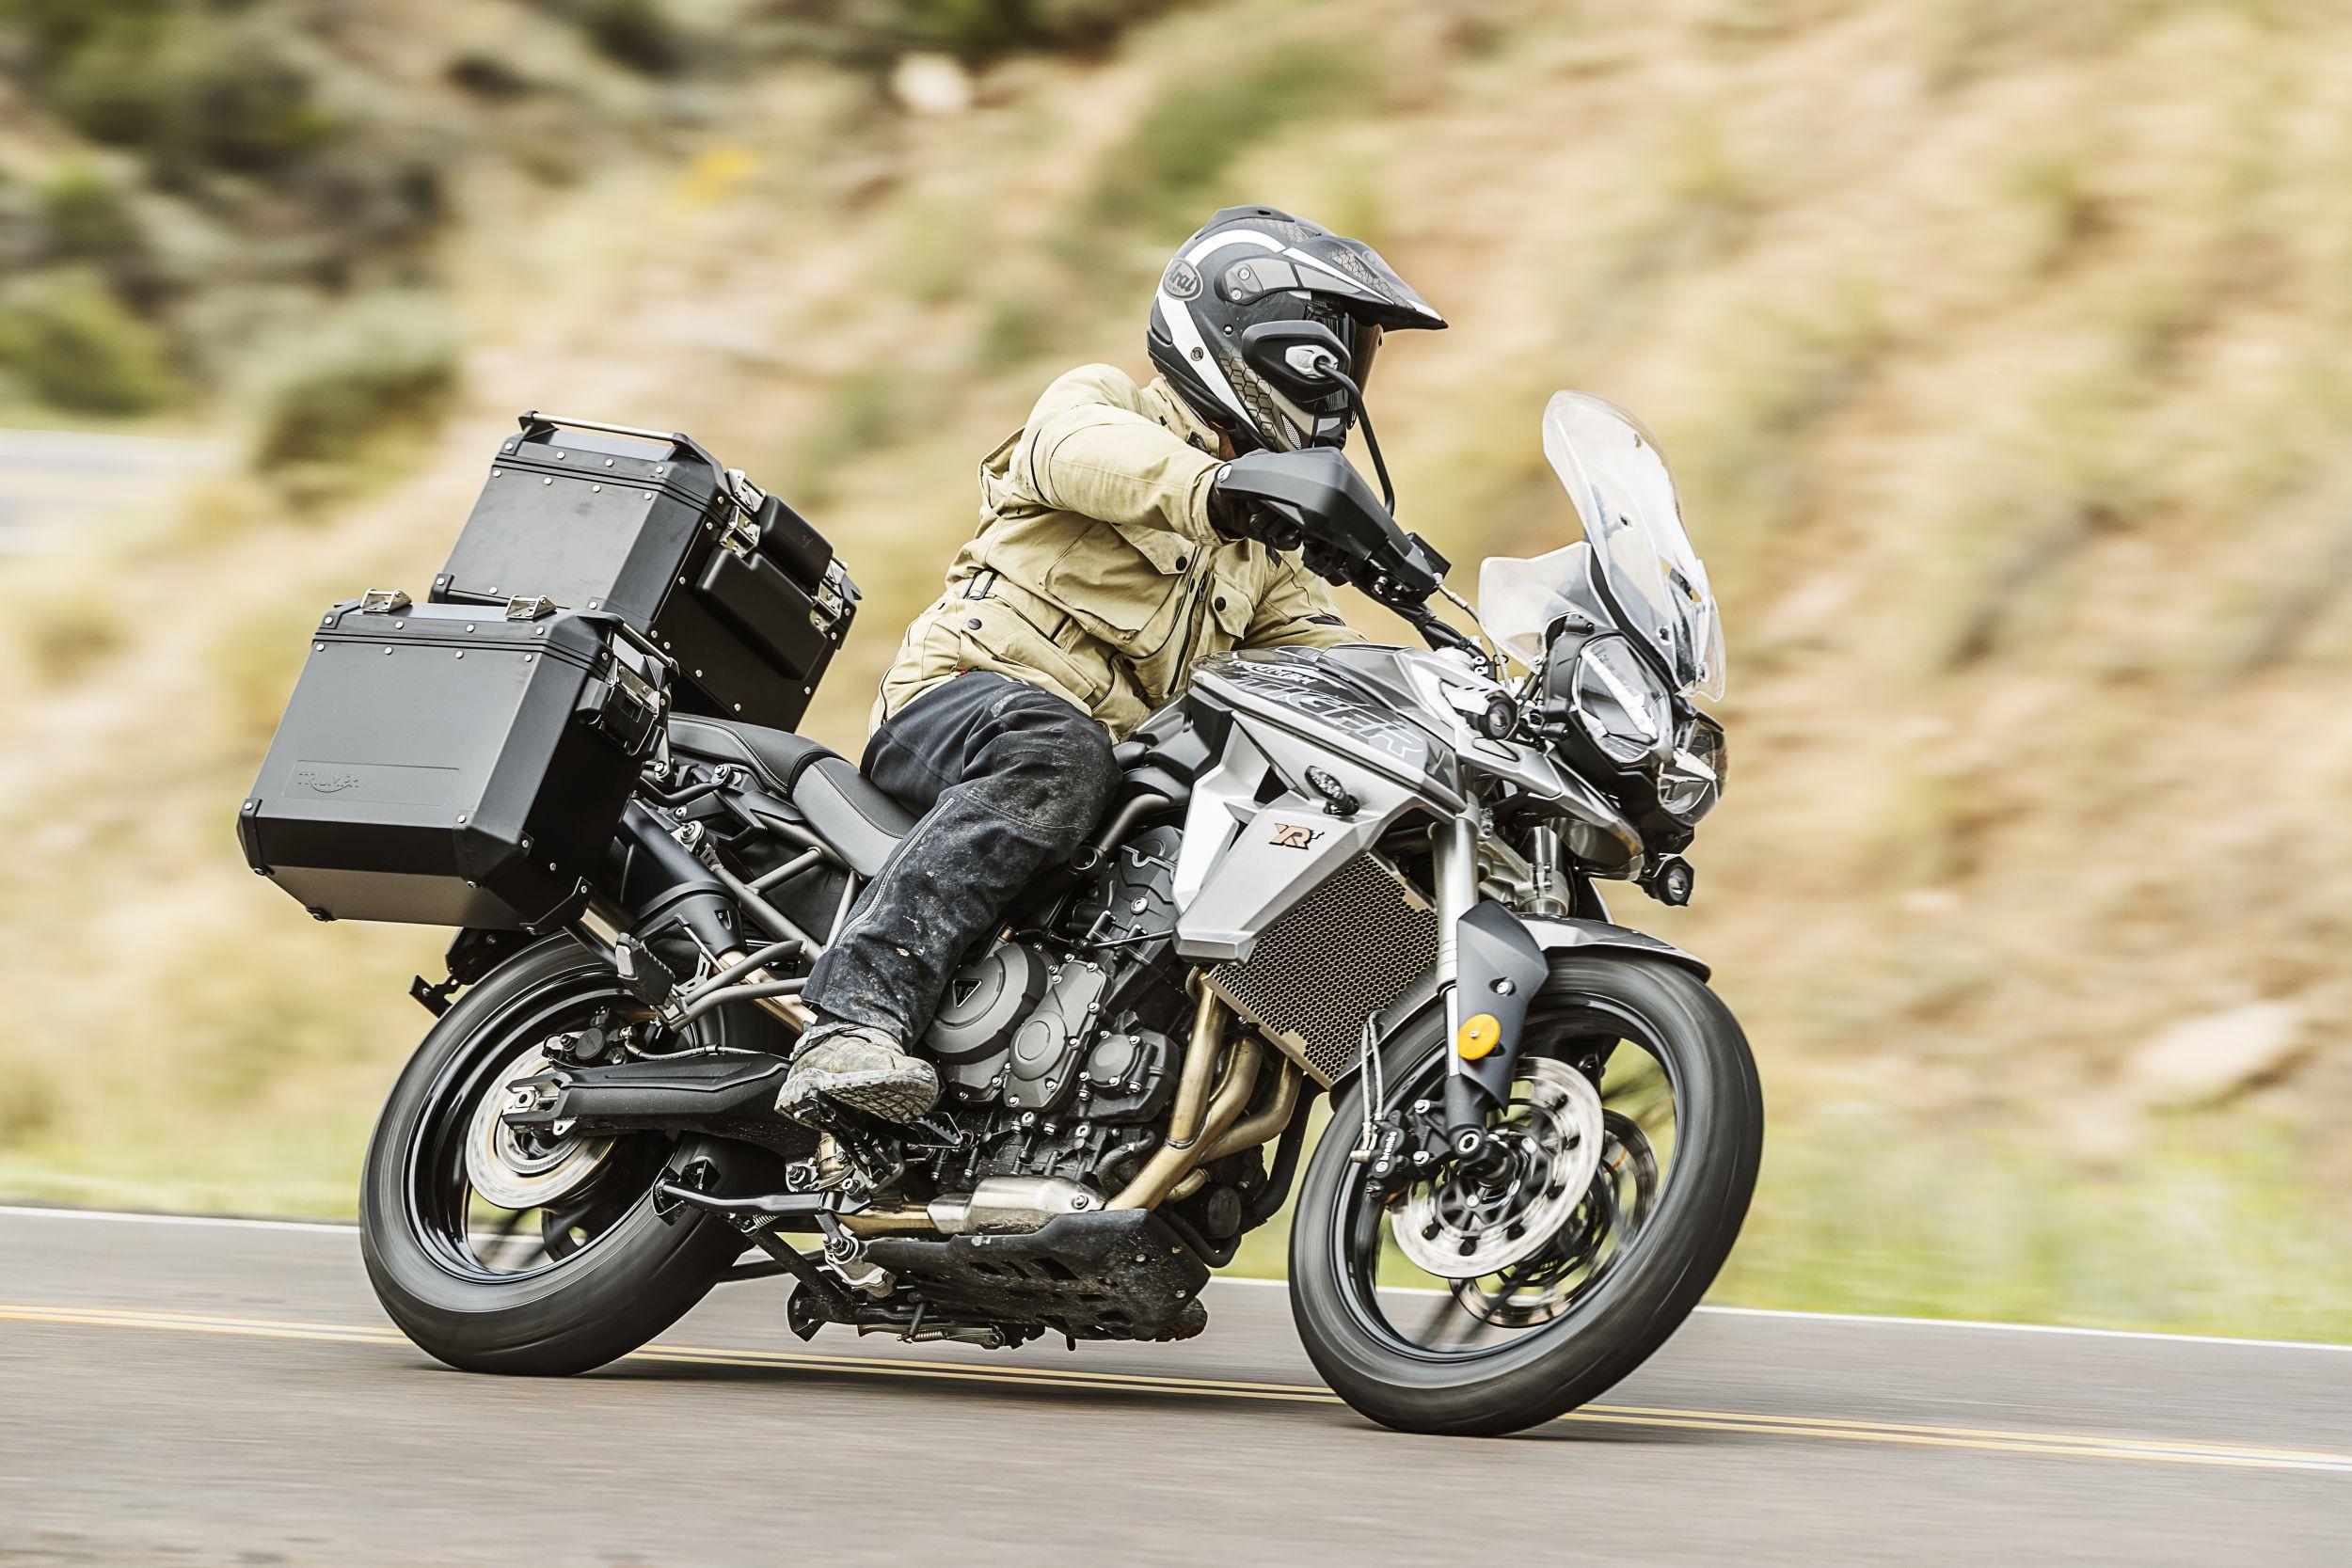 Moto Triumph Tiger 800 XRT - 2019 - R$ 47890.0